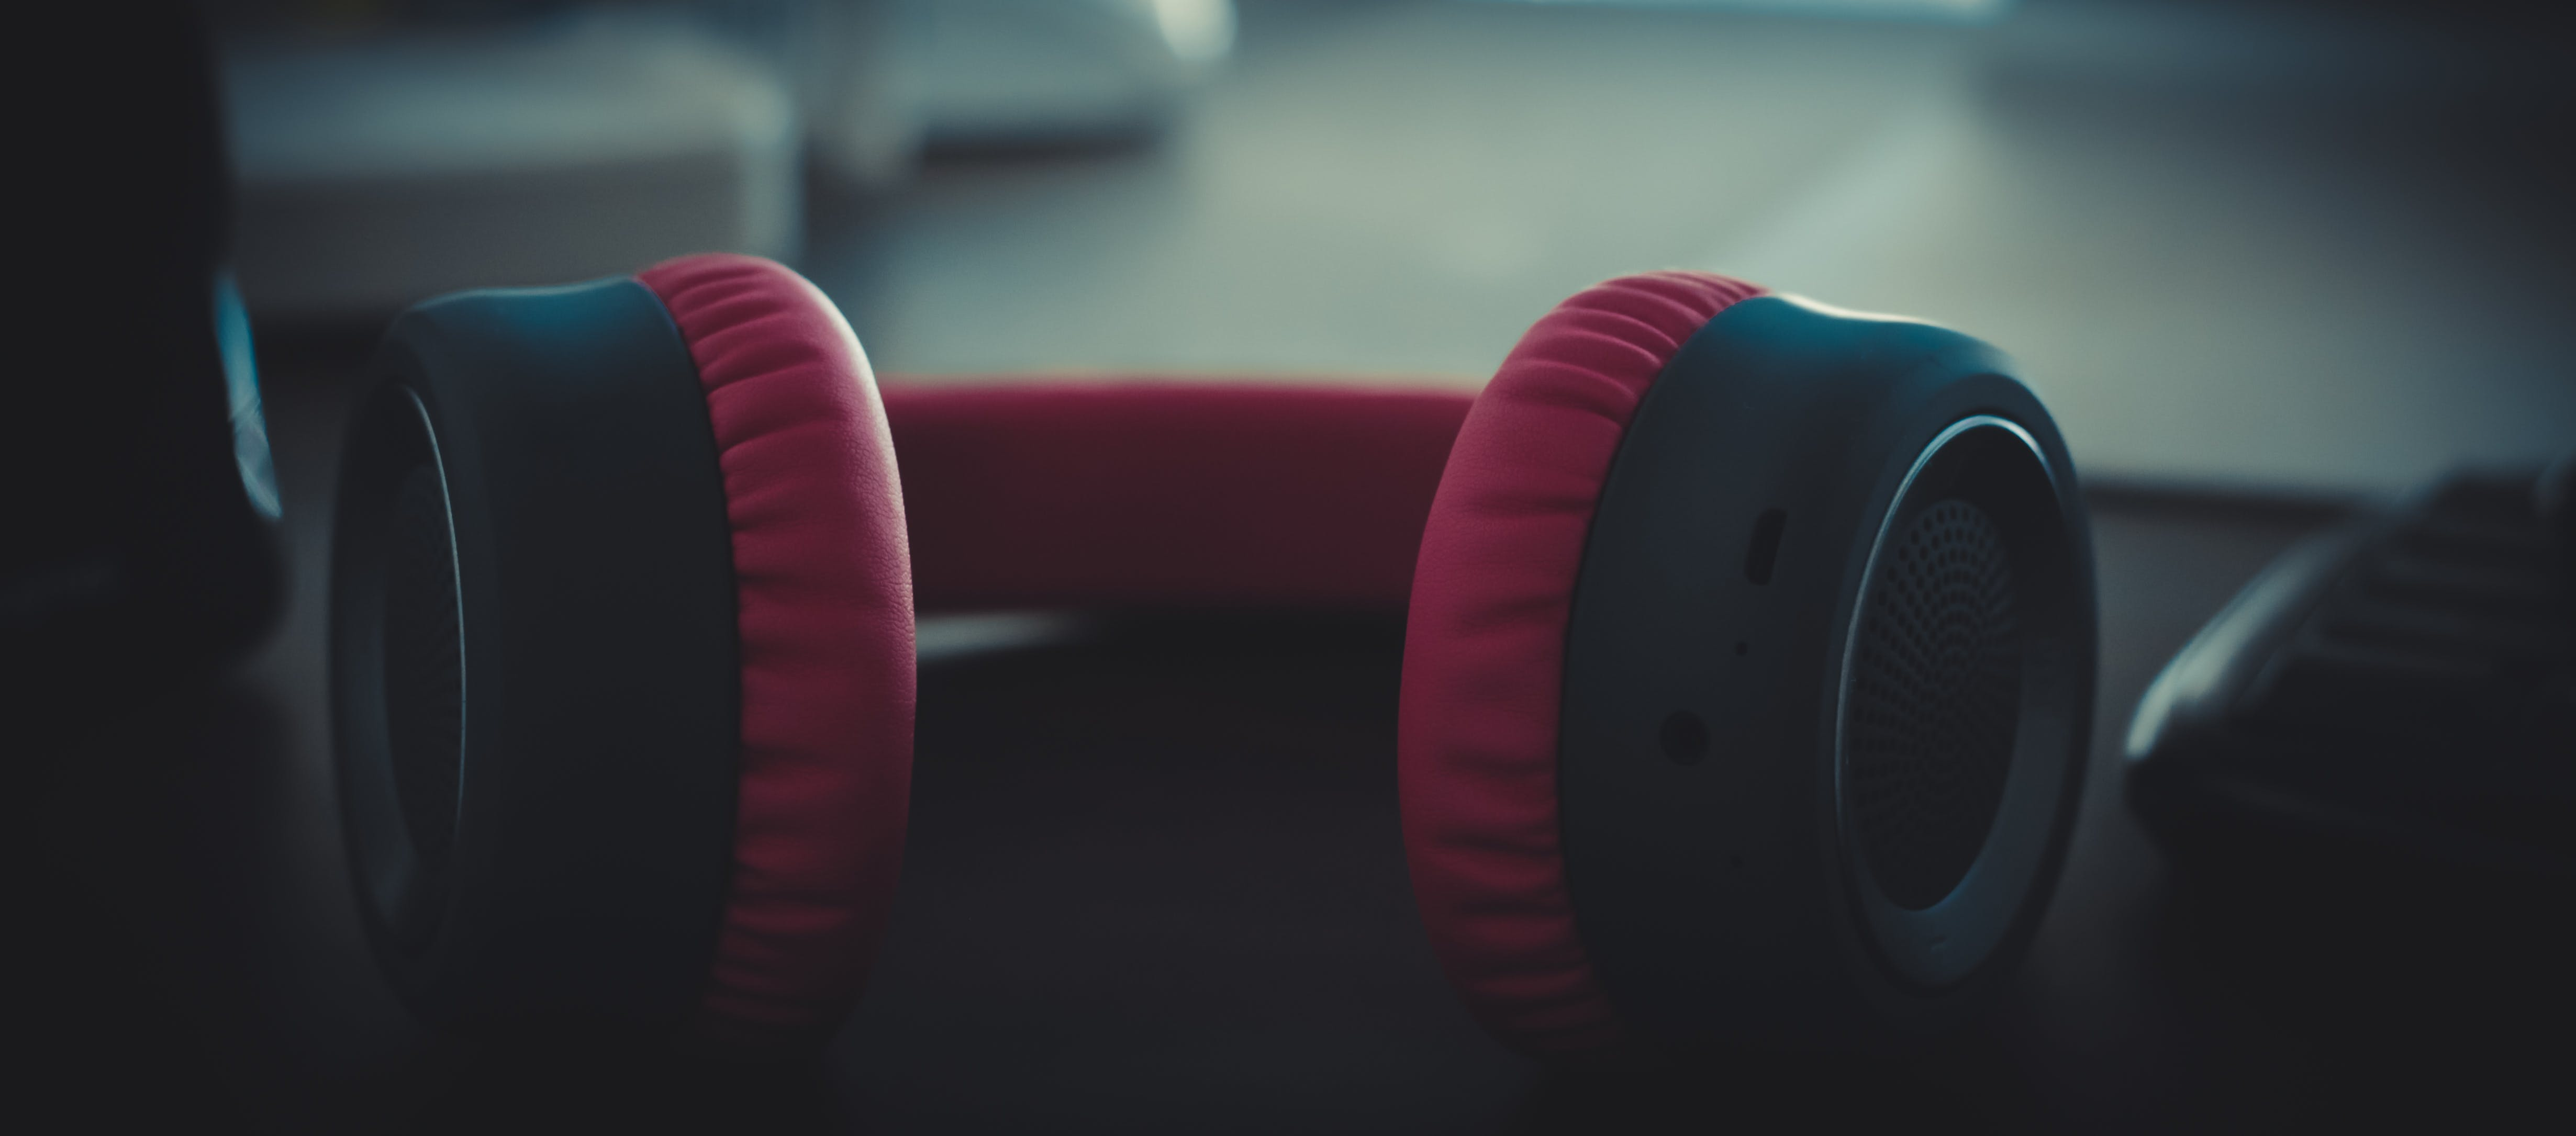 Free stock photo of editing, gadget, grey, headphones